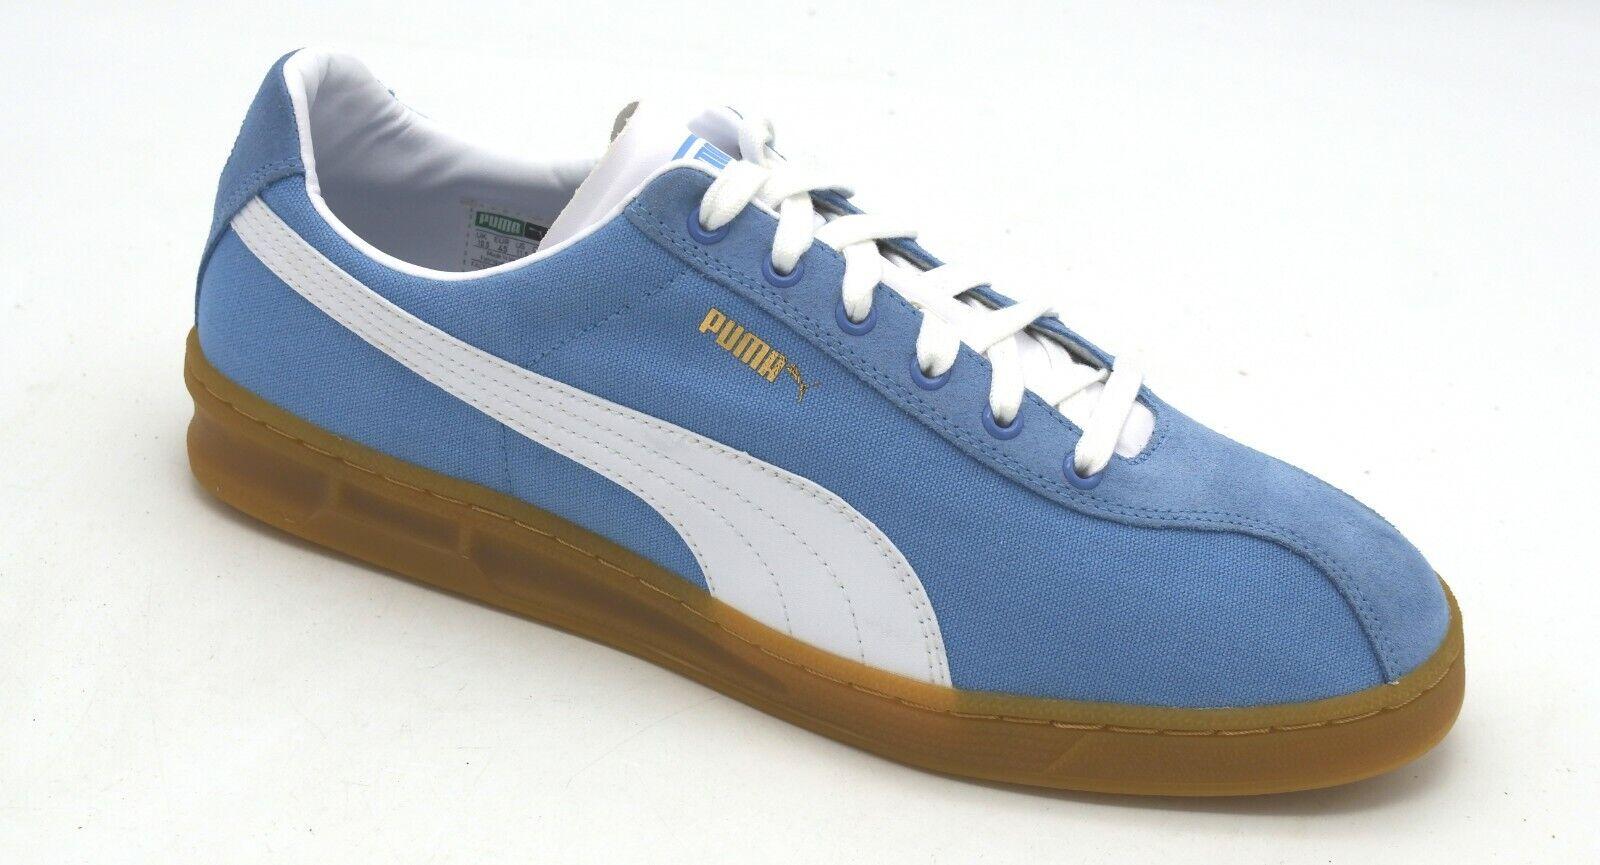 meet f40ec 8e611 J8041 New Mens Puma TK Indoor Summer Allure White Suede Sneaker 11.5 M